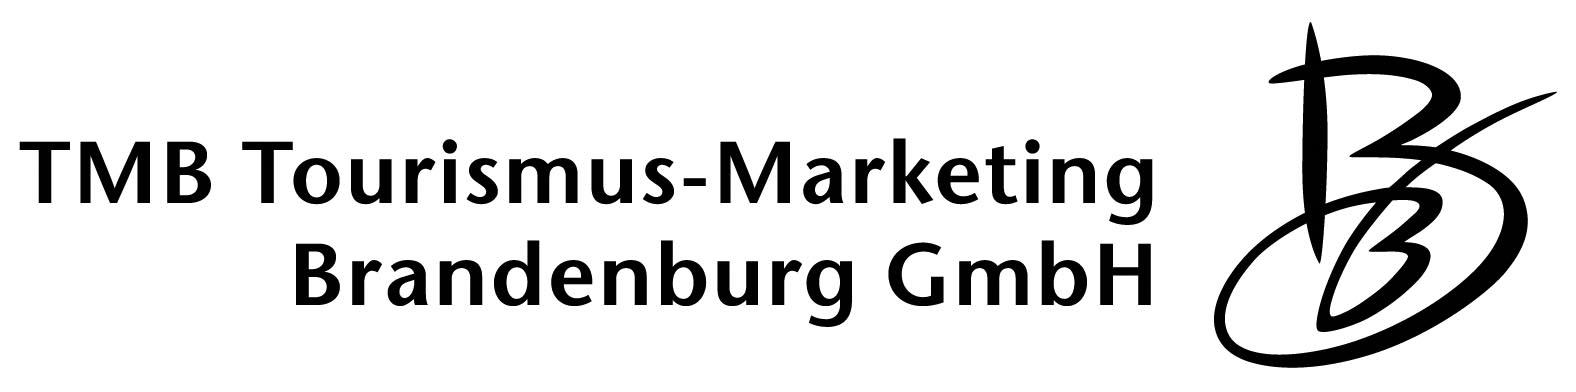 TMB_Logo GmbH.jpg